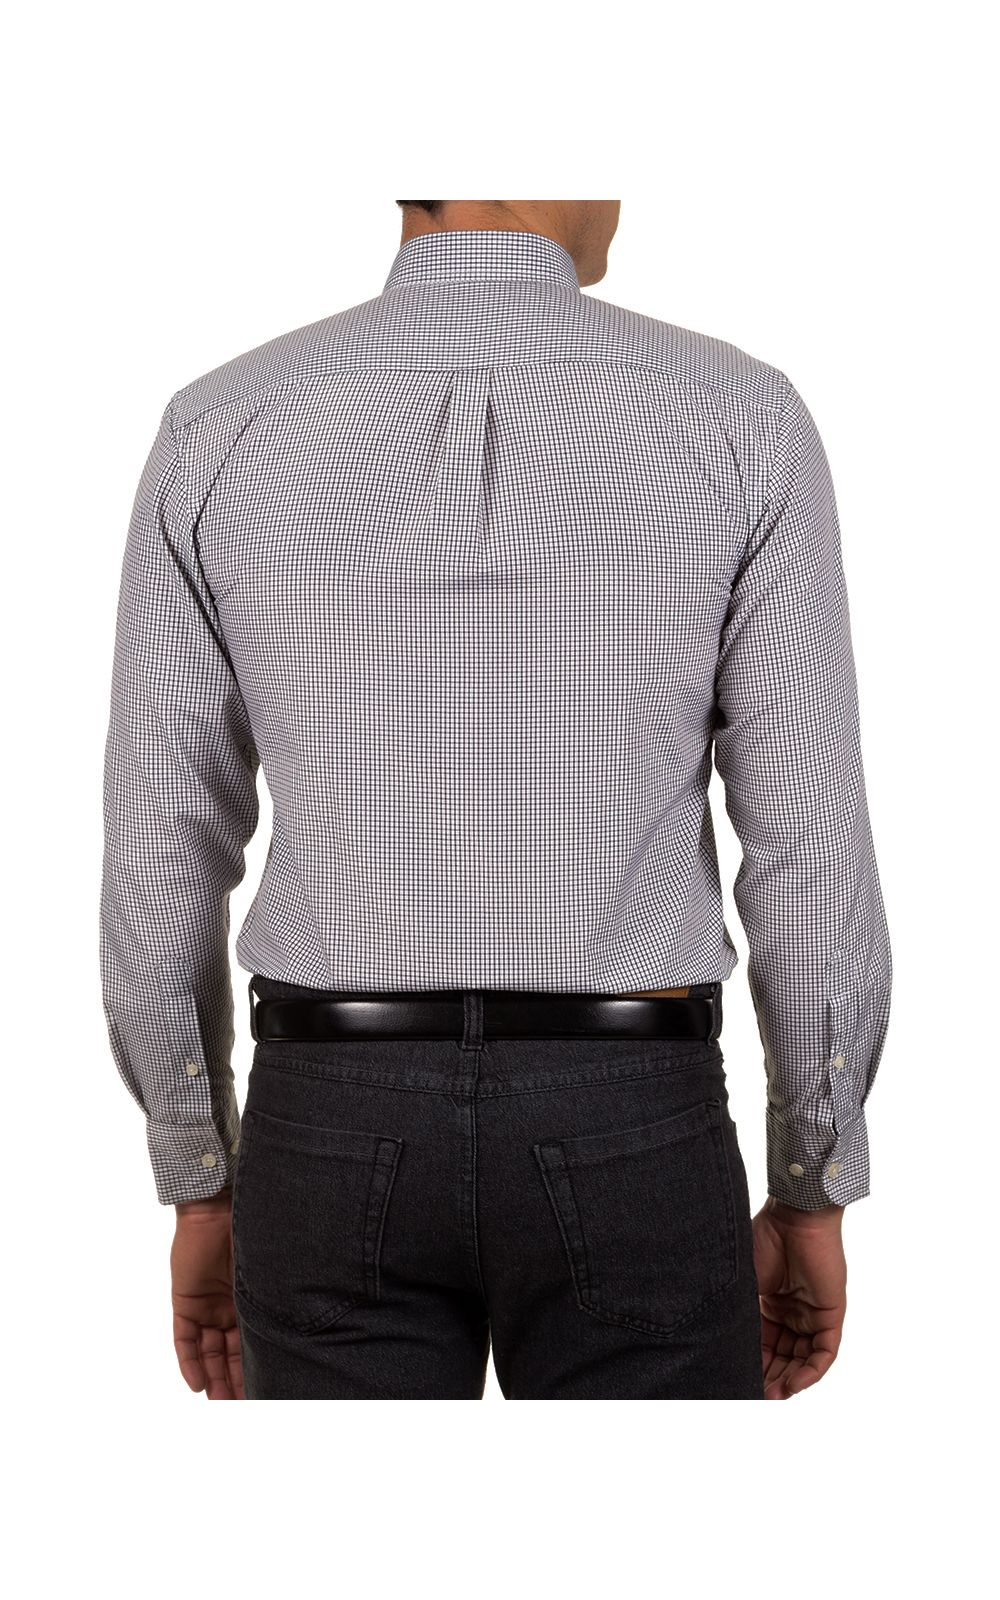 Foto 2 - Camisa Social Masculina Preto Xadrez